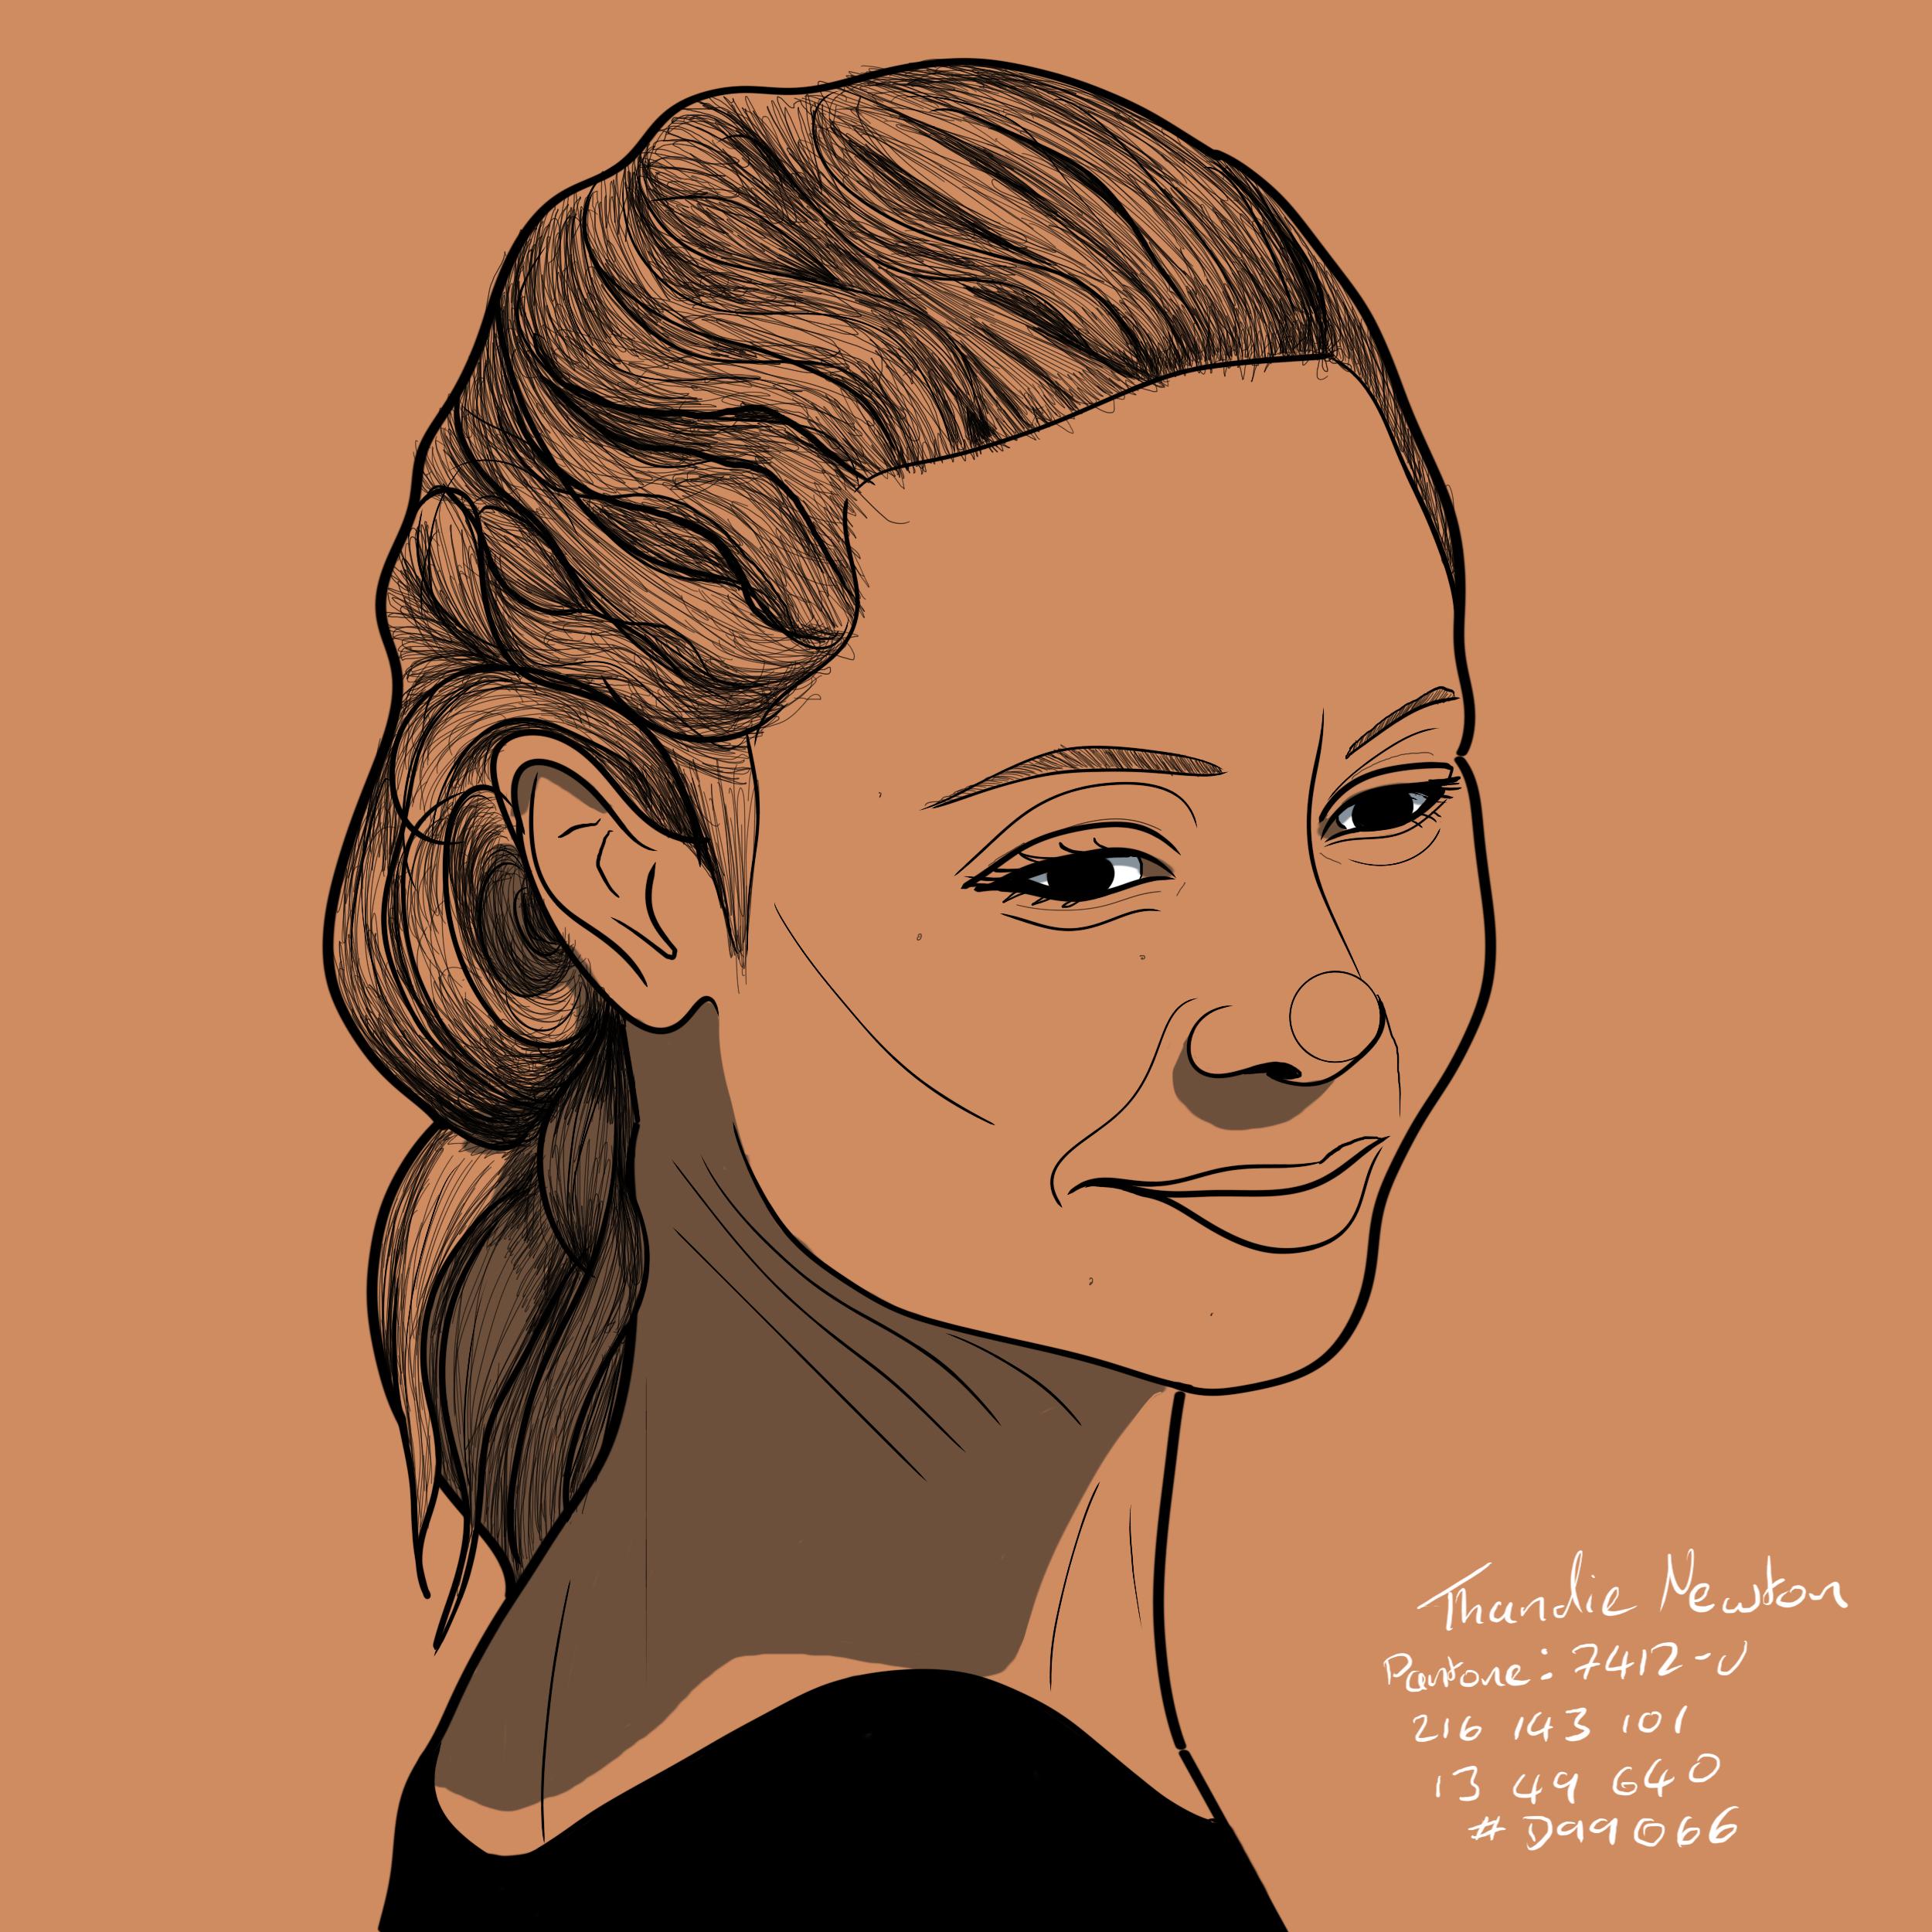 19. Thandie Newton.png